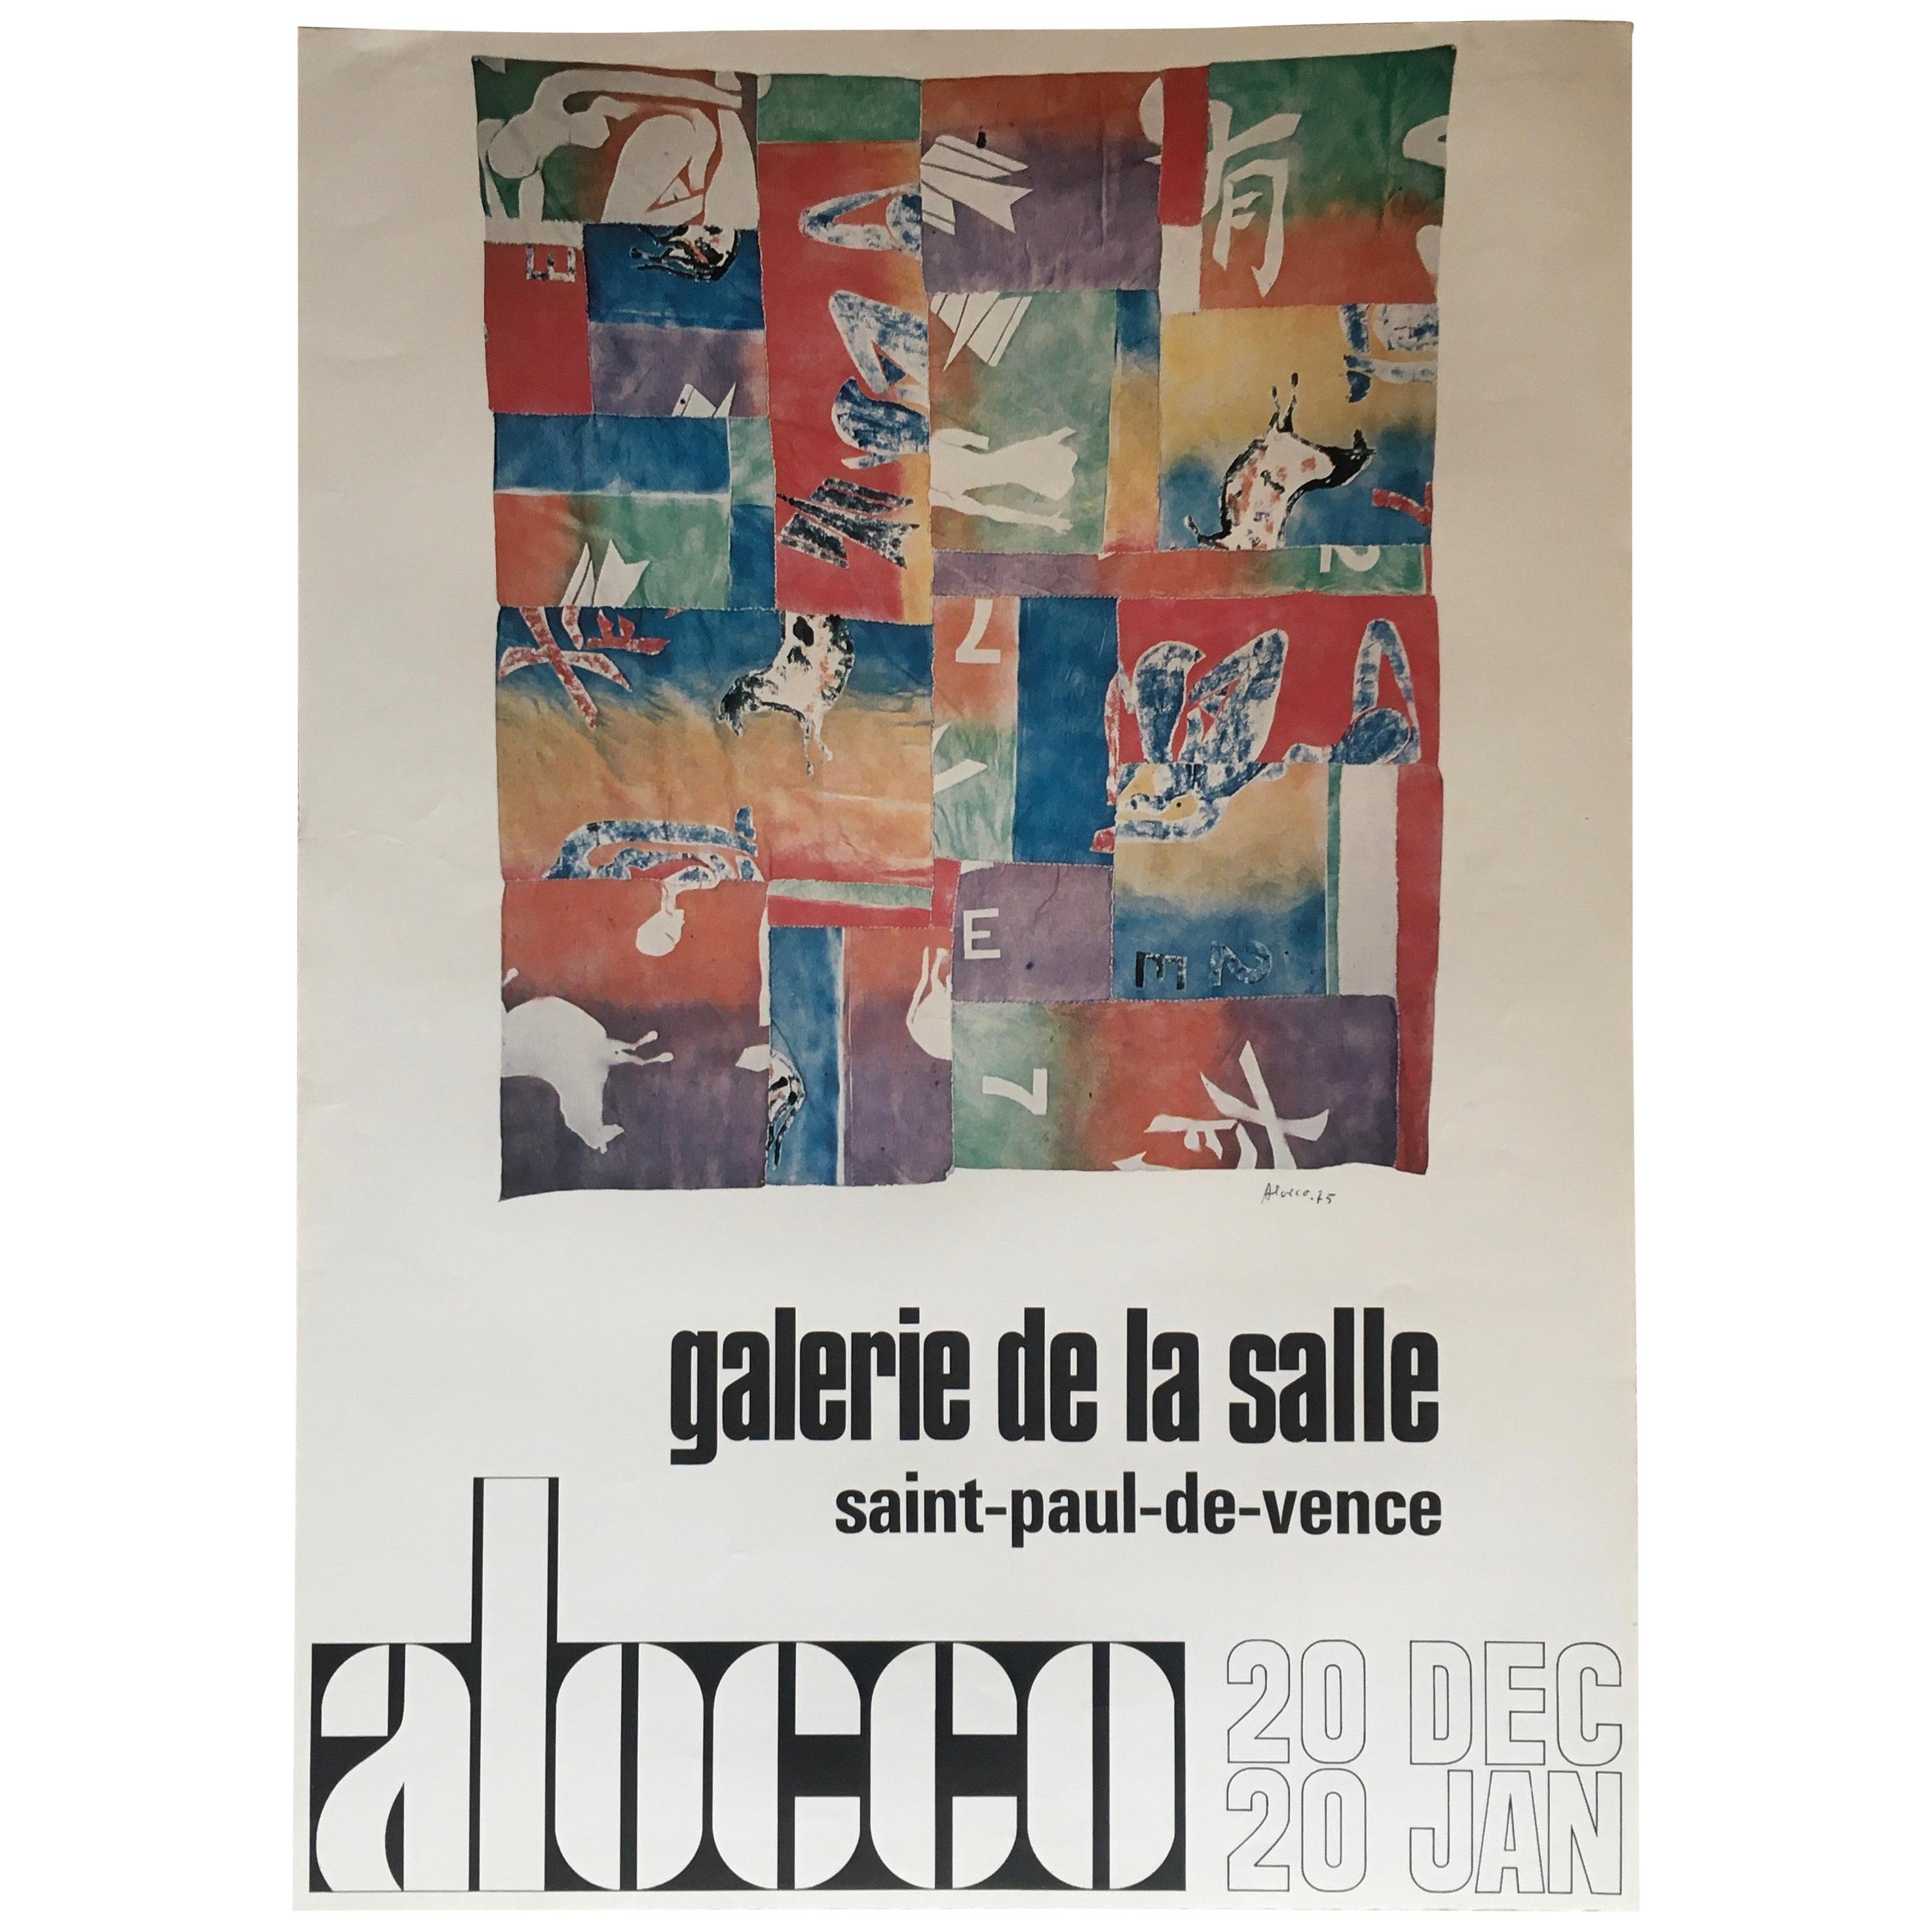 Original Midcentury Art Exhibition Poster by Alocco